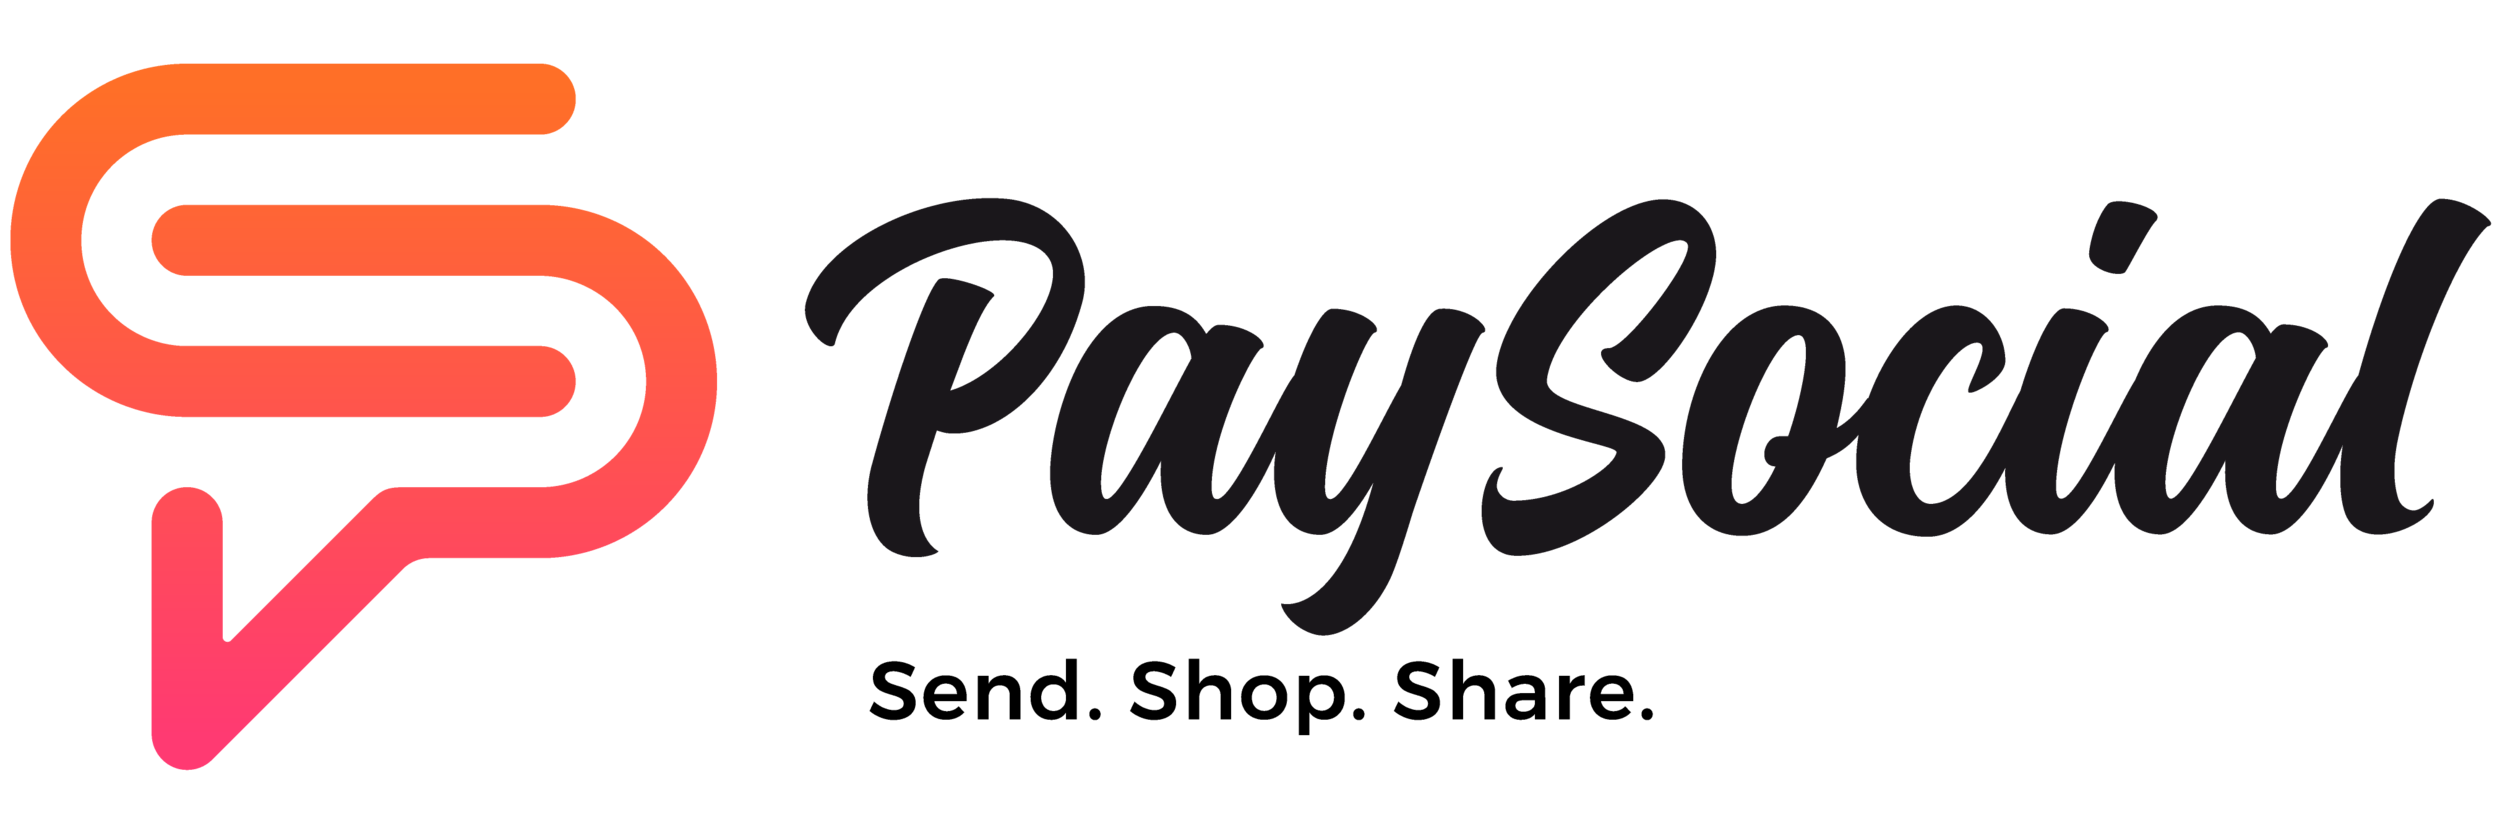 paysocial-logotype-slogan (1).png